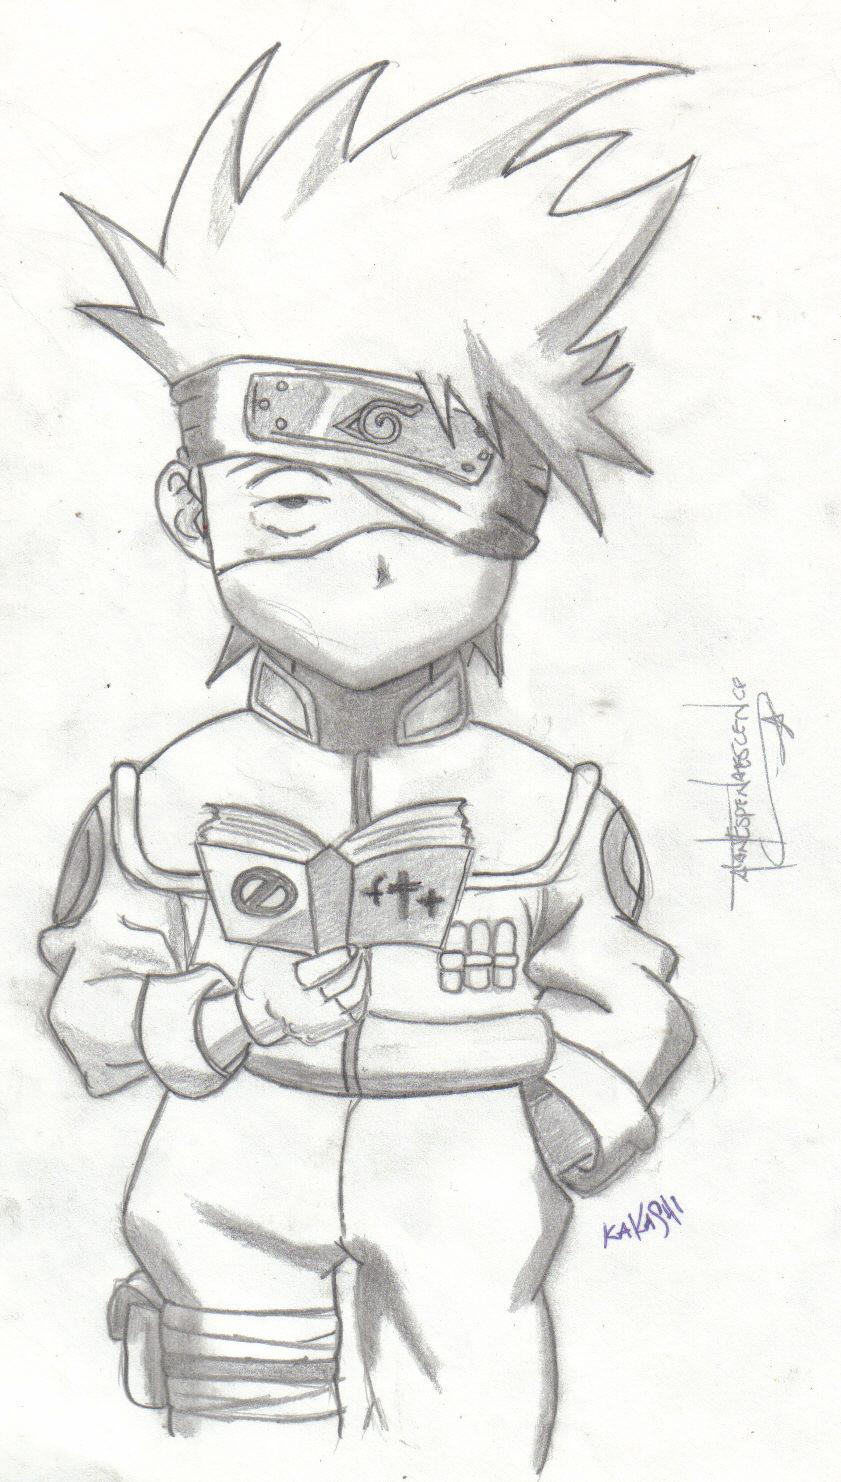 Chibi Kakashi from Naruto by AlanEspenaescence on DeviantArt